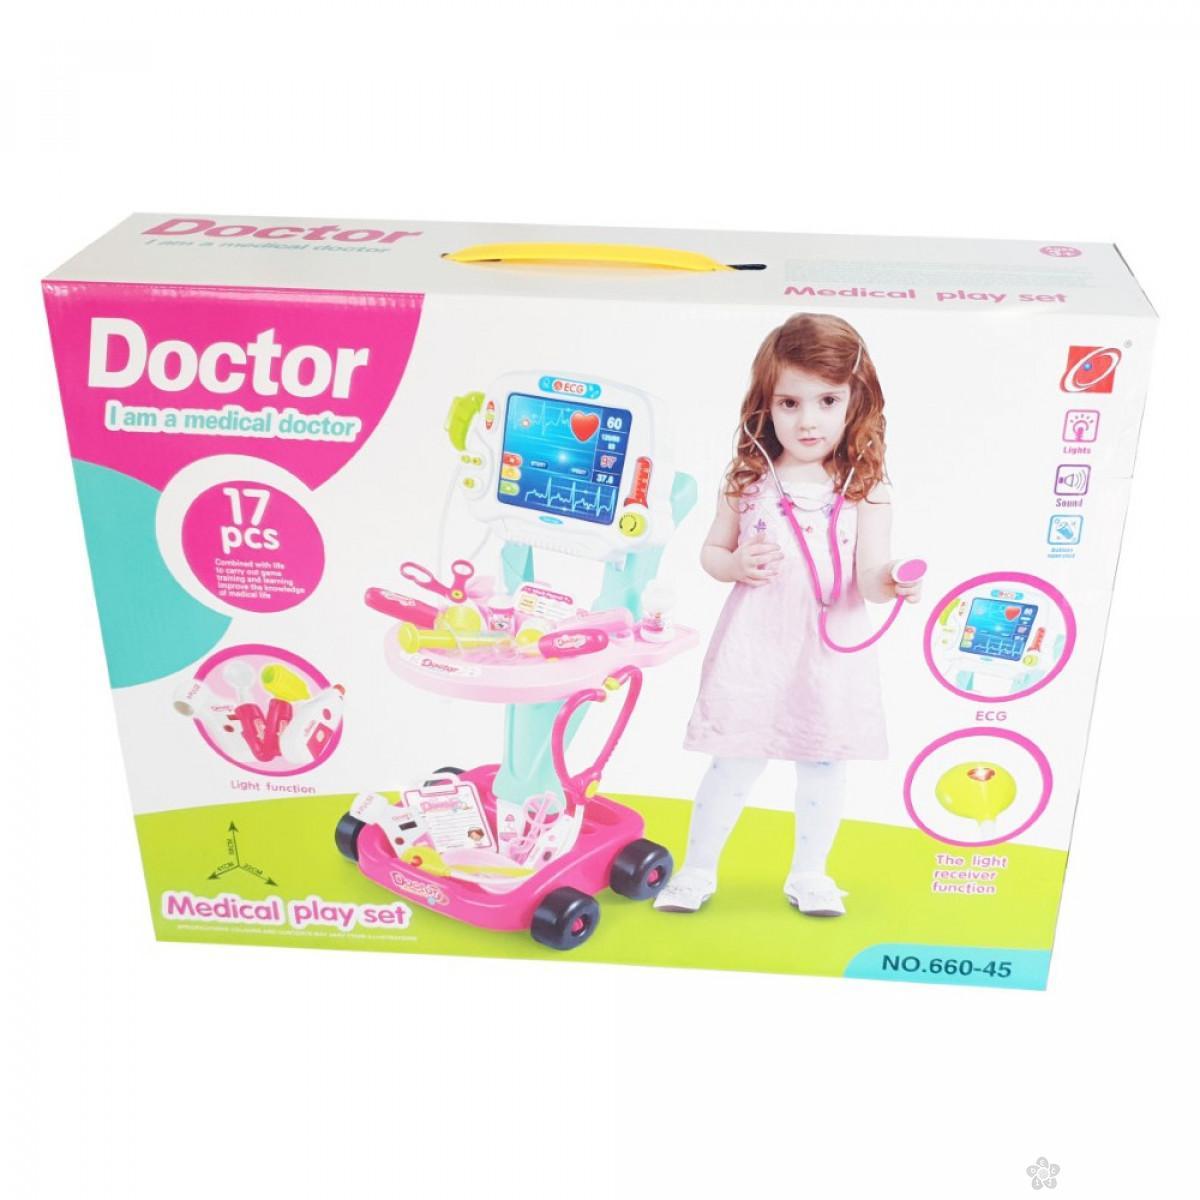 Doktor set 350128